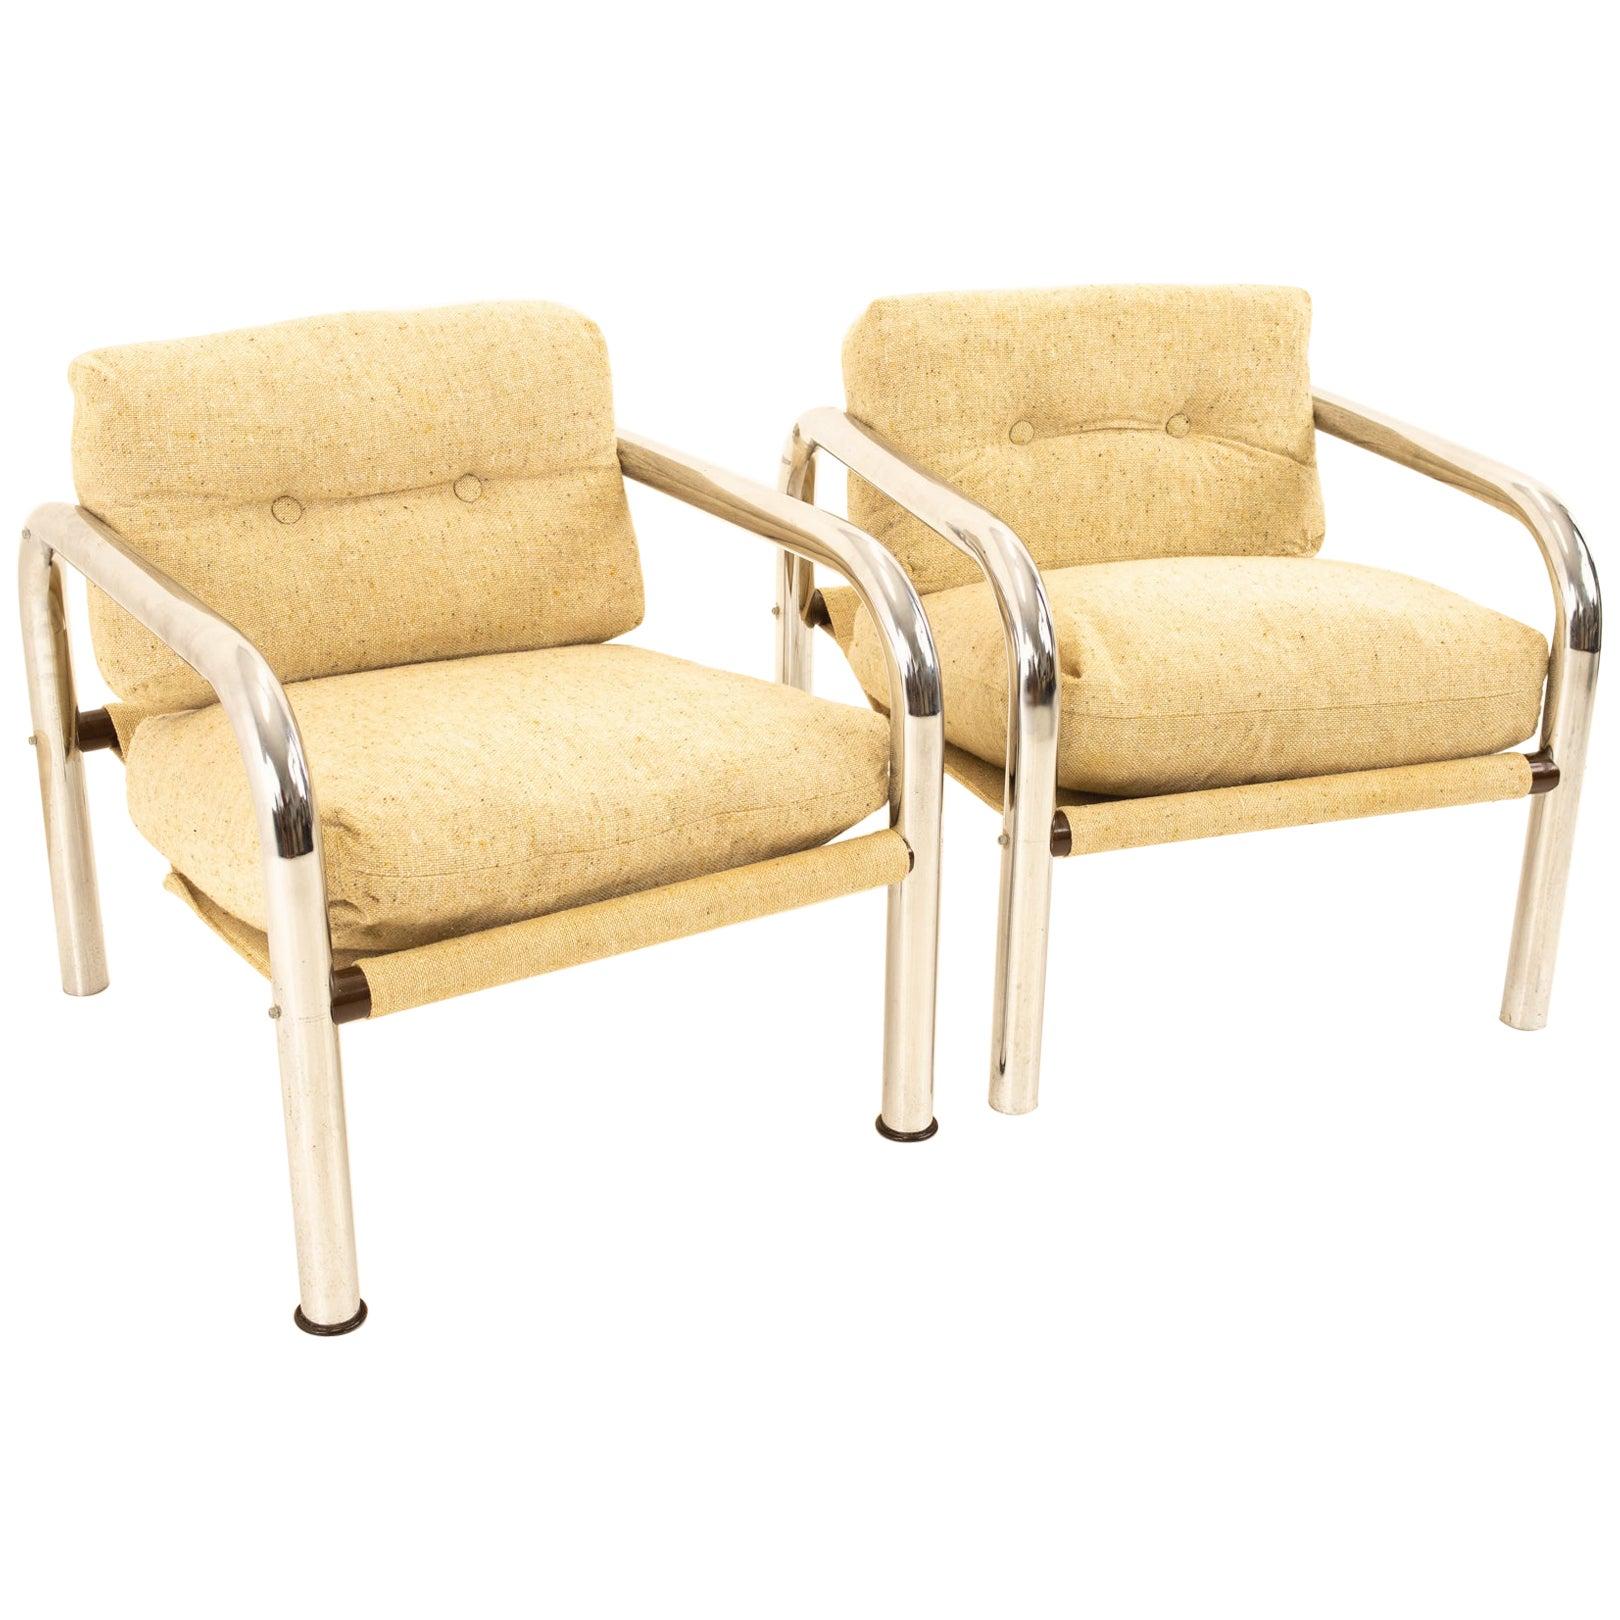 Milo Baughman Style Mid Century Chrome Lounge Chairs, Pair